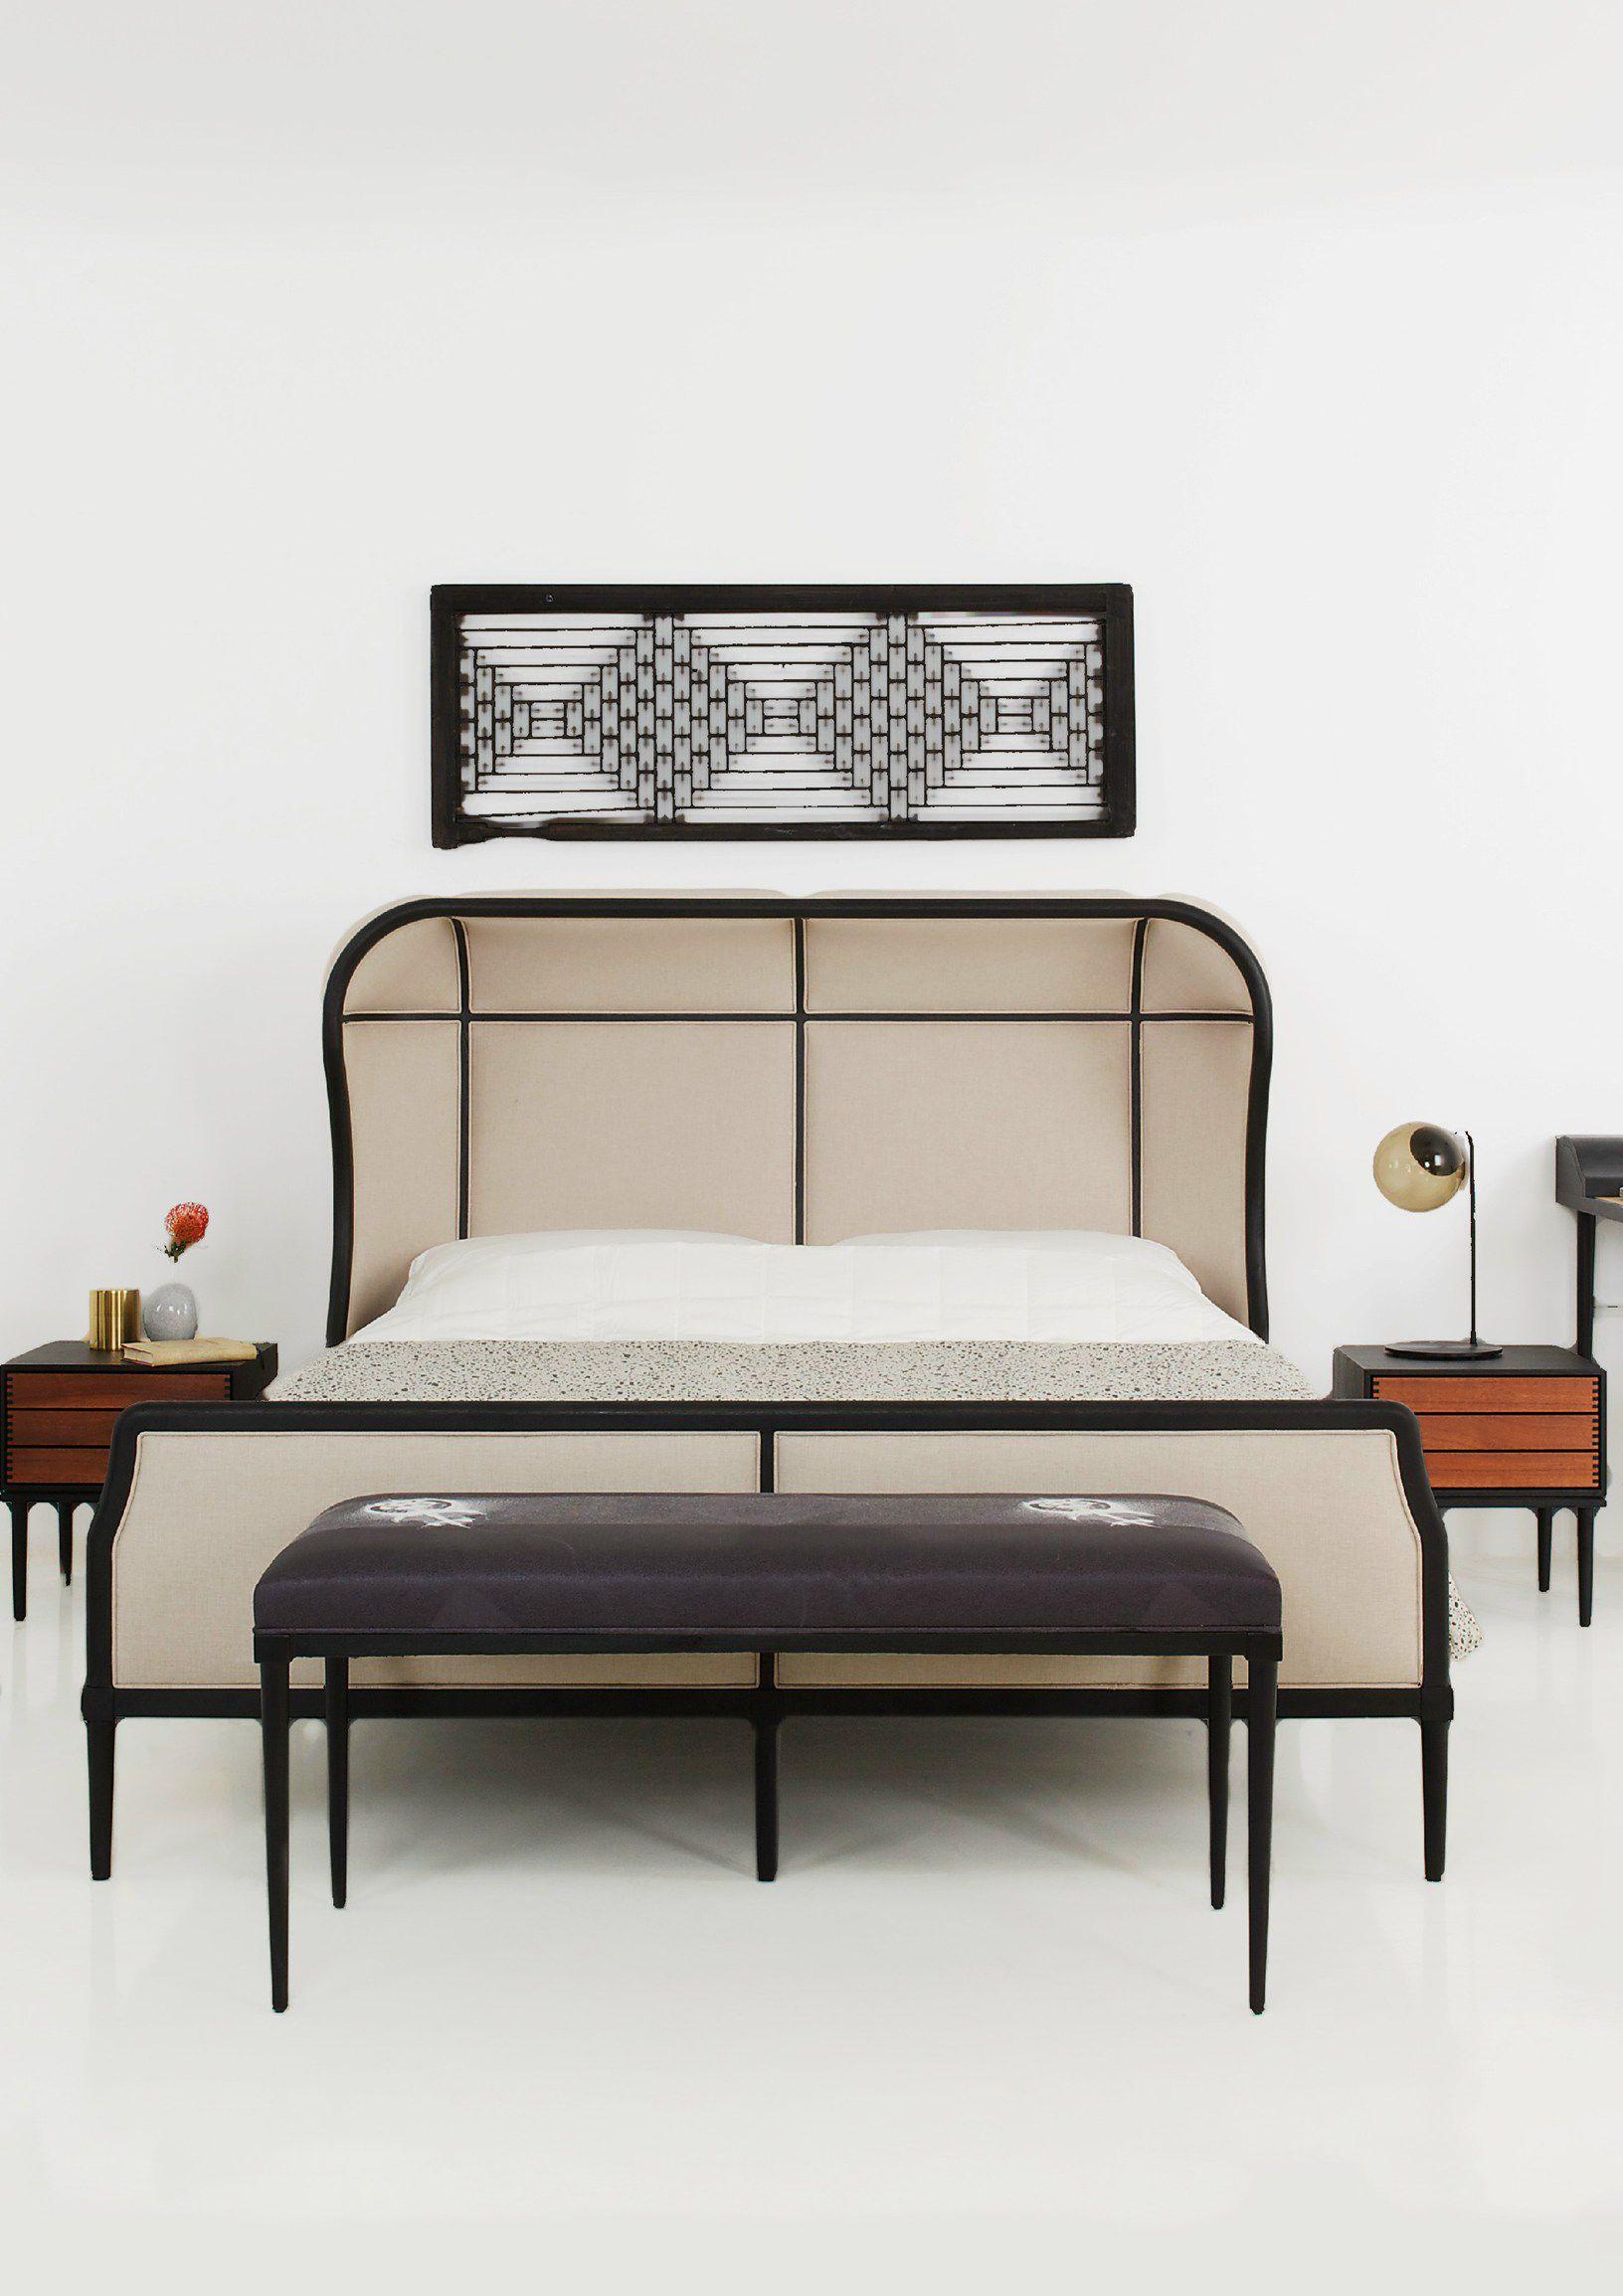 Laval Bench Stellar Works Bed Furniture Bedroom Furniture Bedroom Headboard